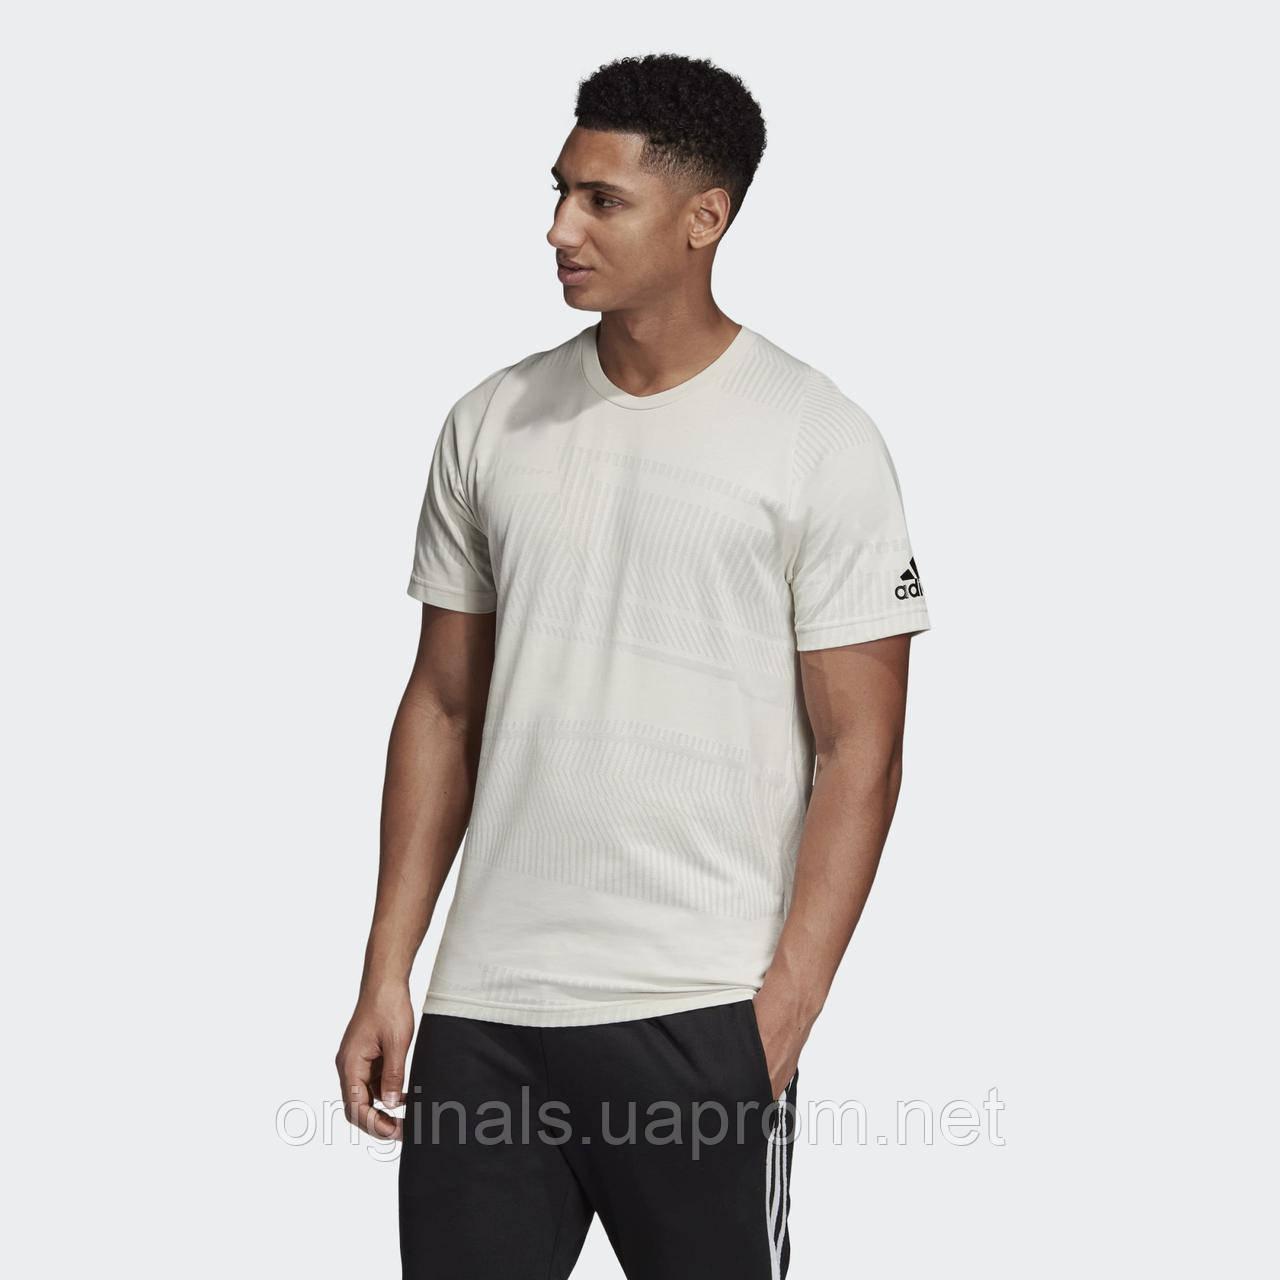 Мужская футболка Adidas ID Jacquard DU1118